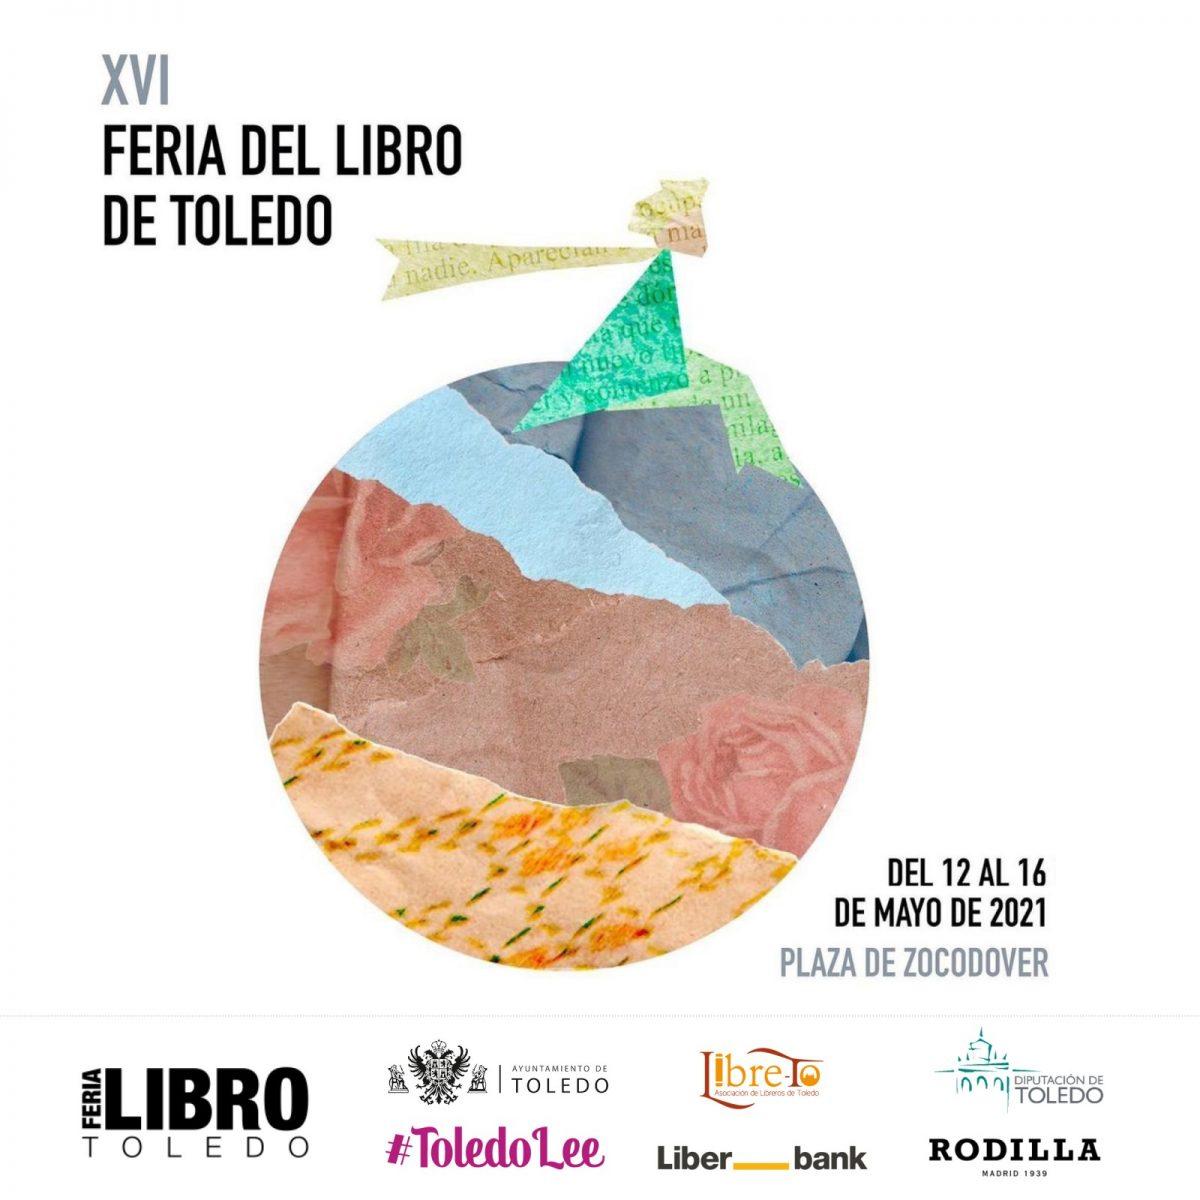 https://www.toledo.es/wp-content/uploads/2021/05/cuadrado-feria-del-libro-2021-1200x1200.jpg. XVI Feria del Libro de Toledo